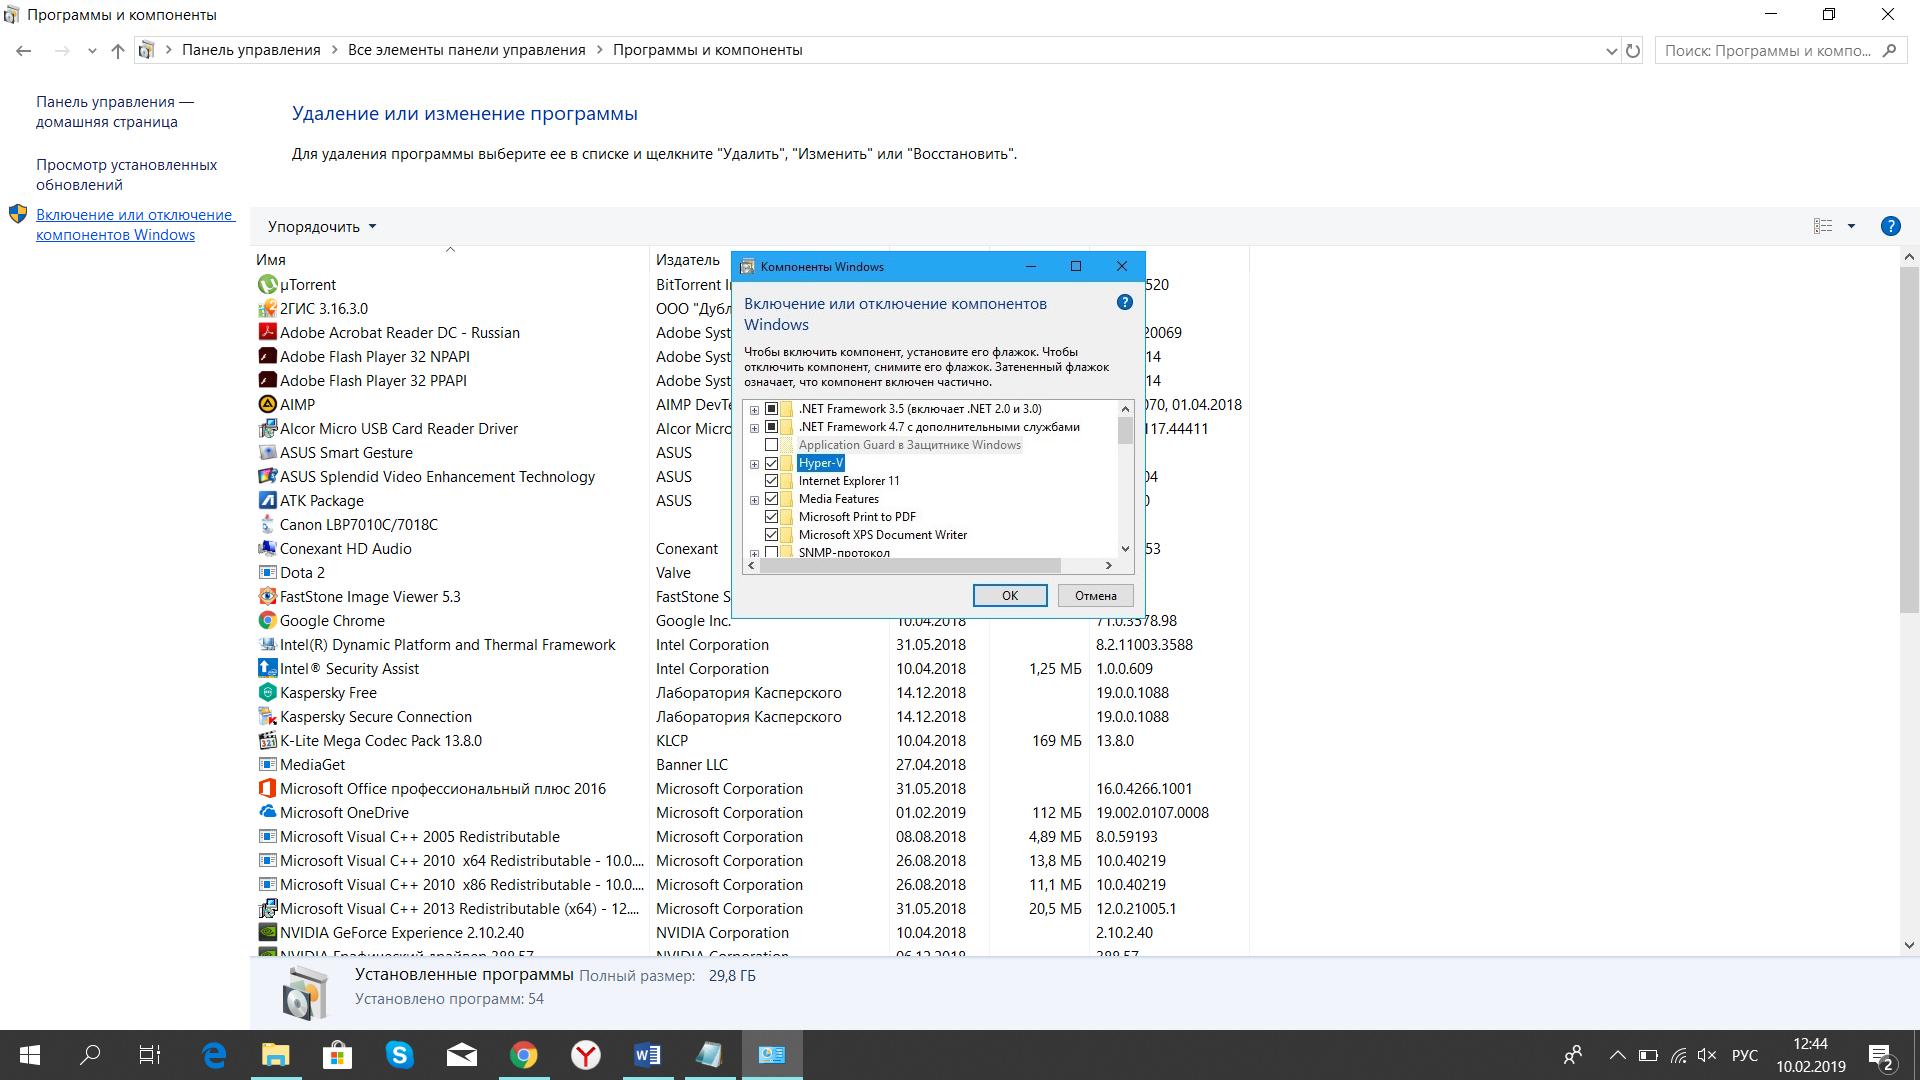 4.-Vklyuchenie-komponenta-Hyper-V-v-Windows-10.png